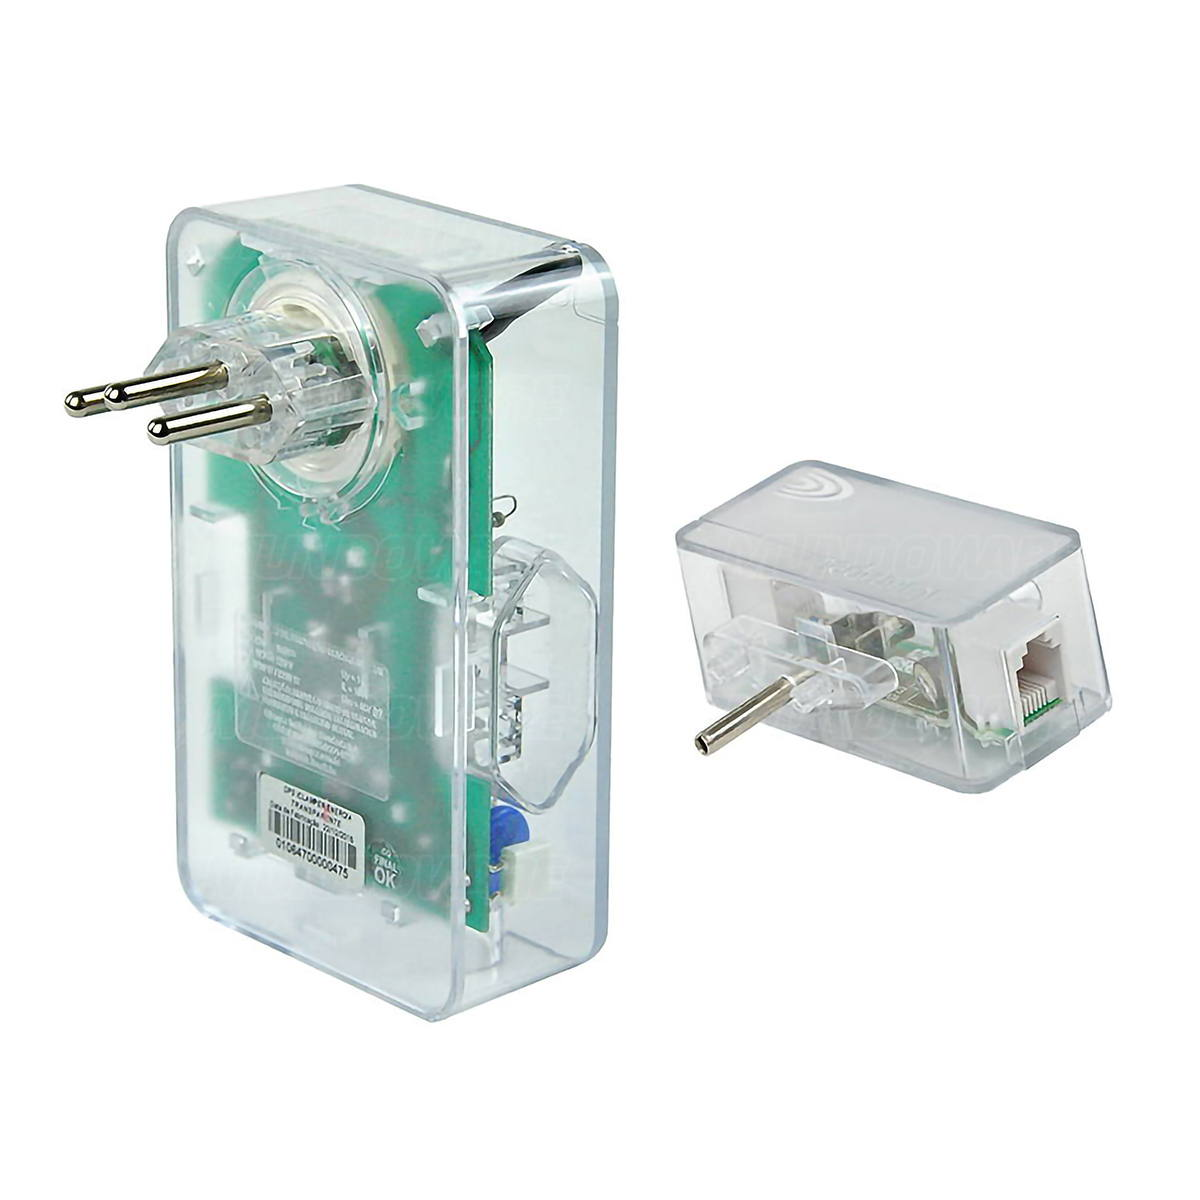 Combo DPS Clamper 3 Tomadas 10A Bivolt Energia 3 + iClamper Tel para Conector RJ11 para Proteção contra Raios e Surtos